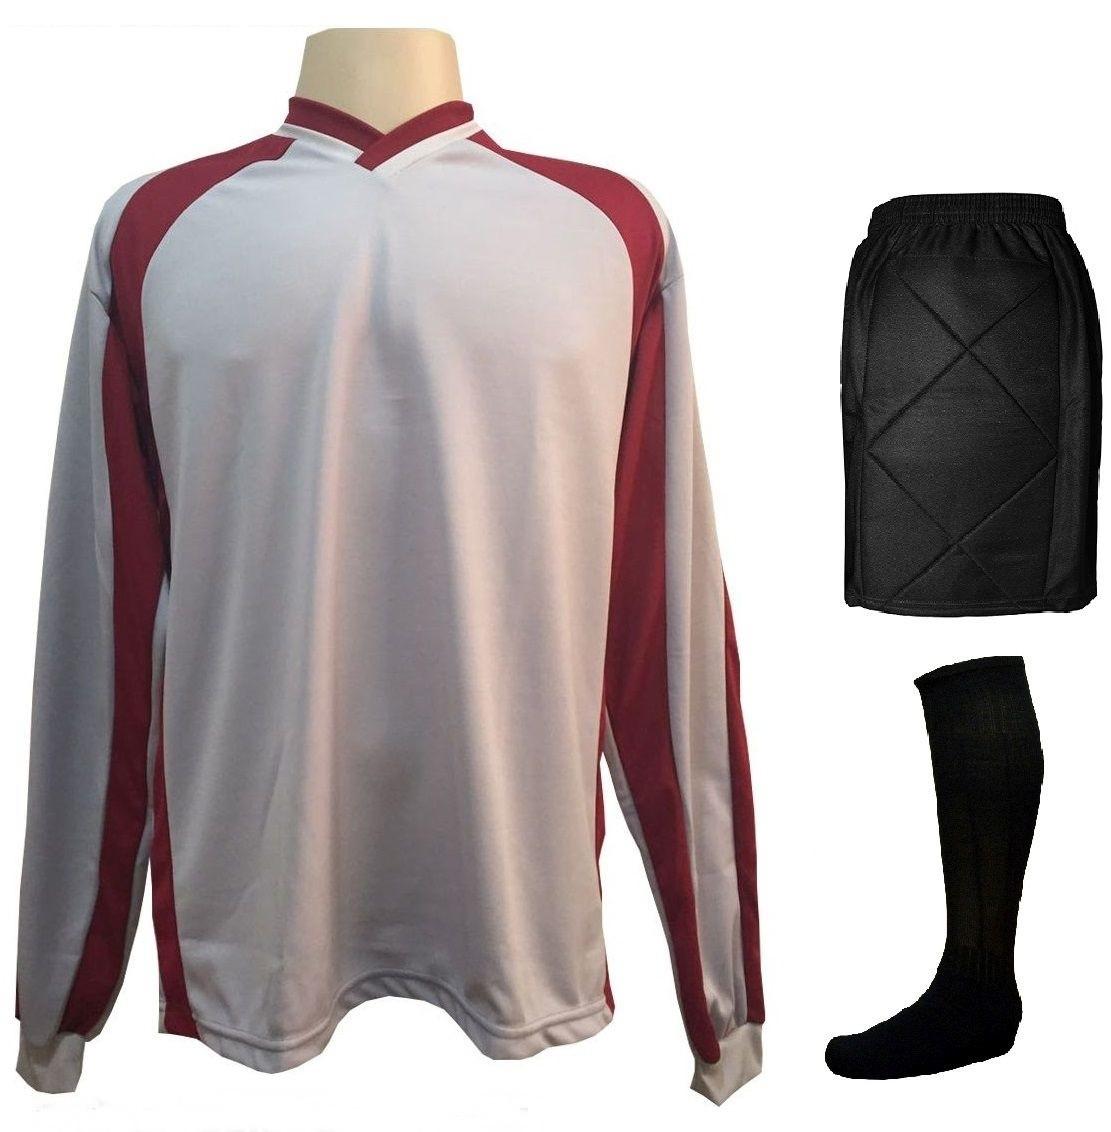 261a52fdc0153 ... Uniforme Esportivo Completo modelo Suécia 14+1 (14 camisas Preto Branco  + 14